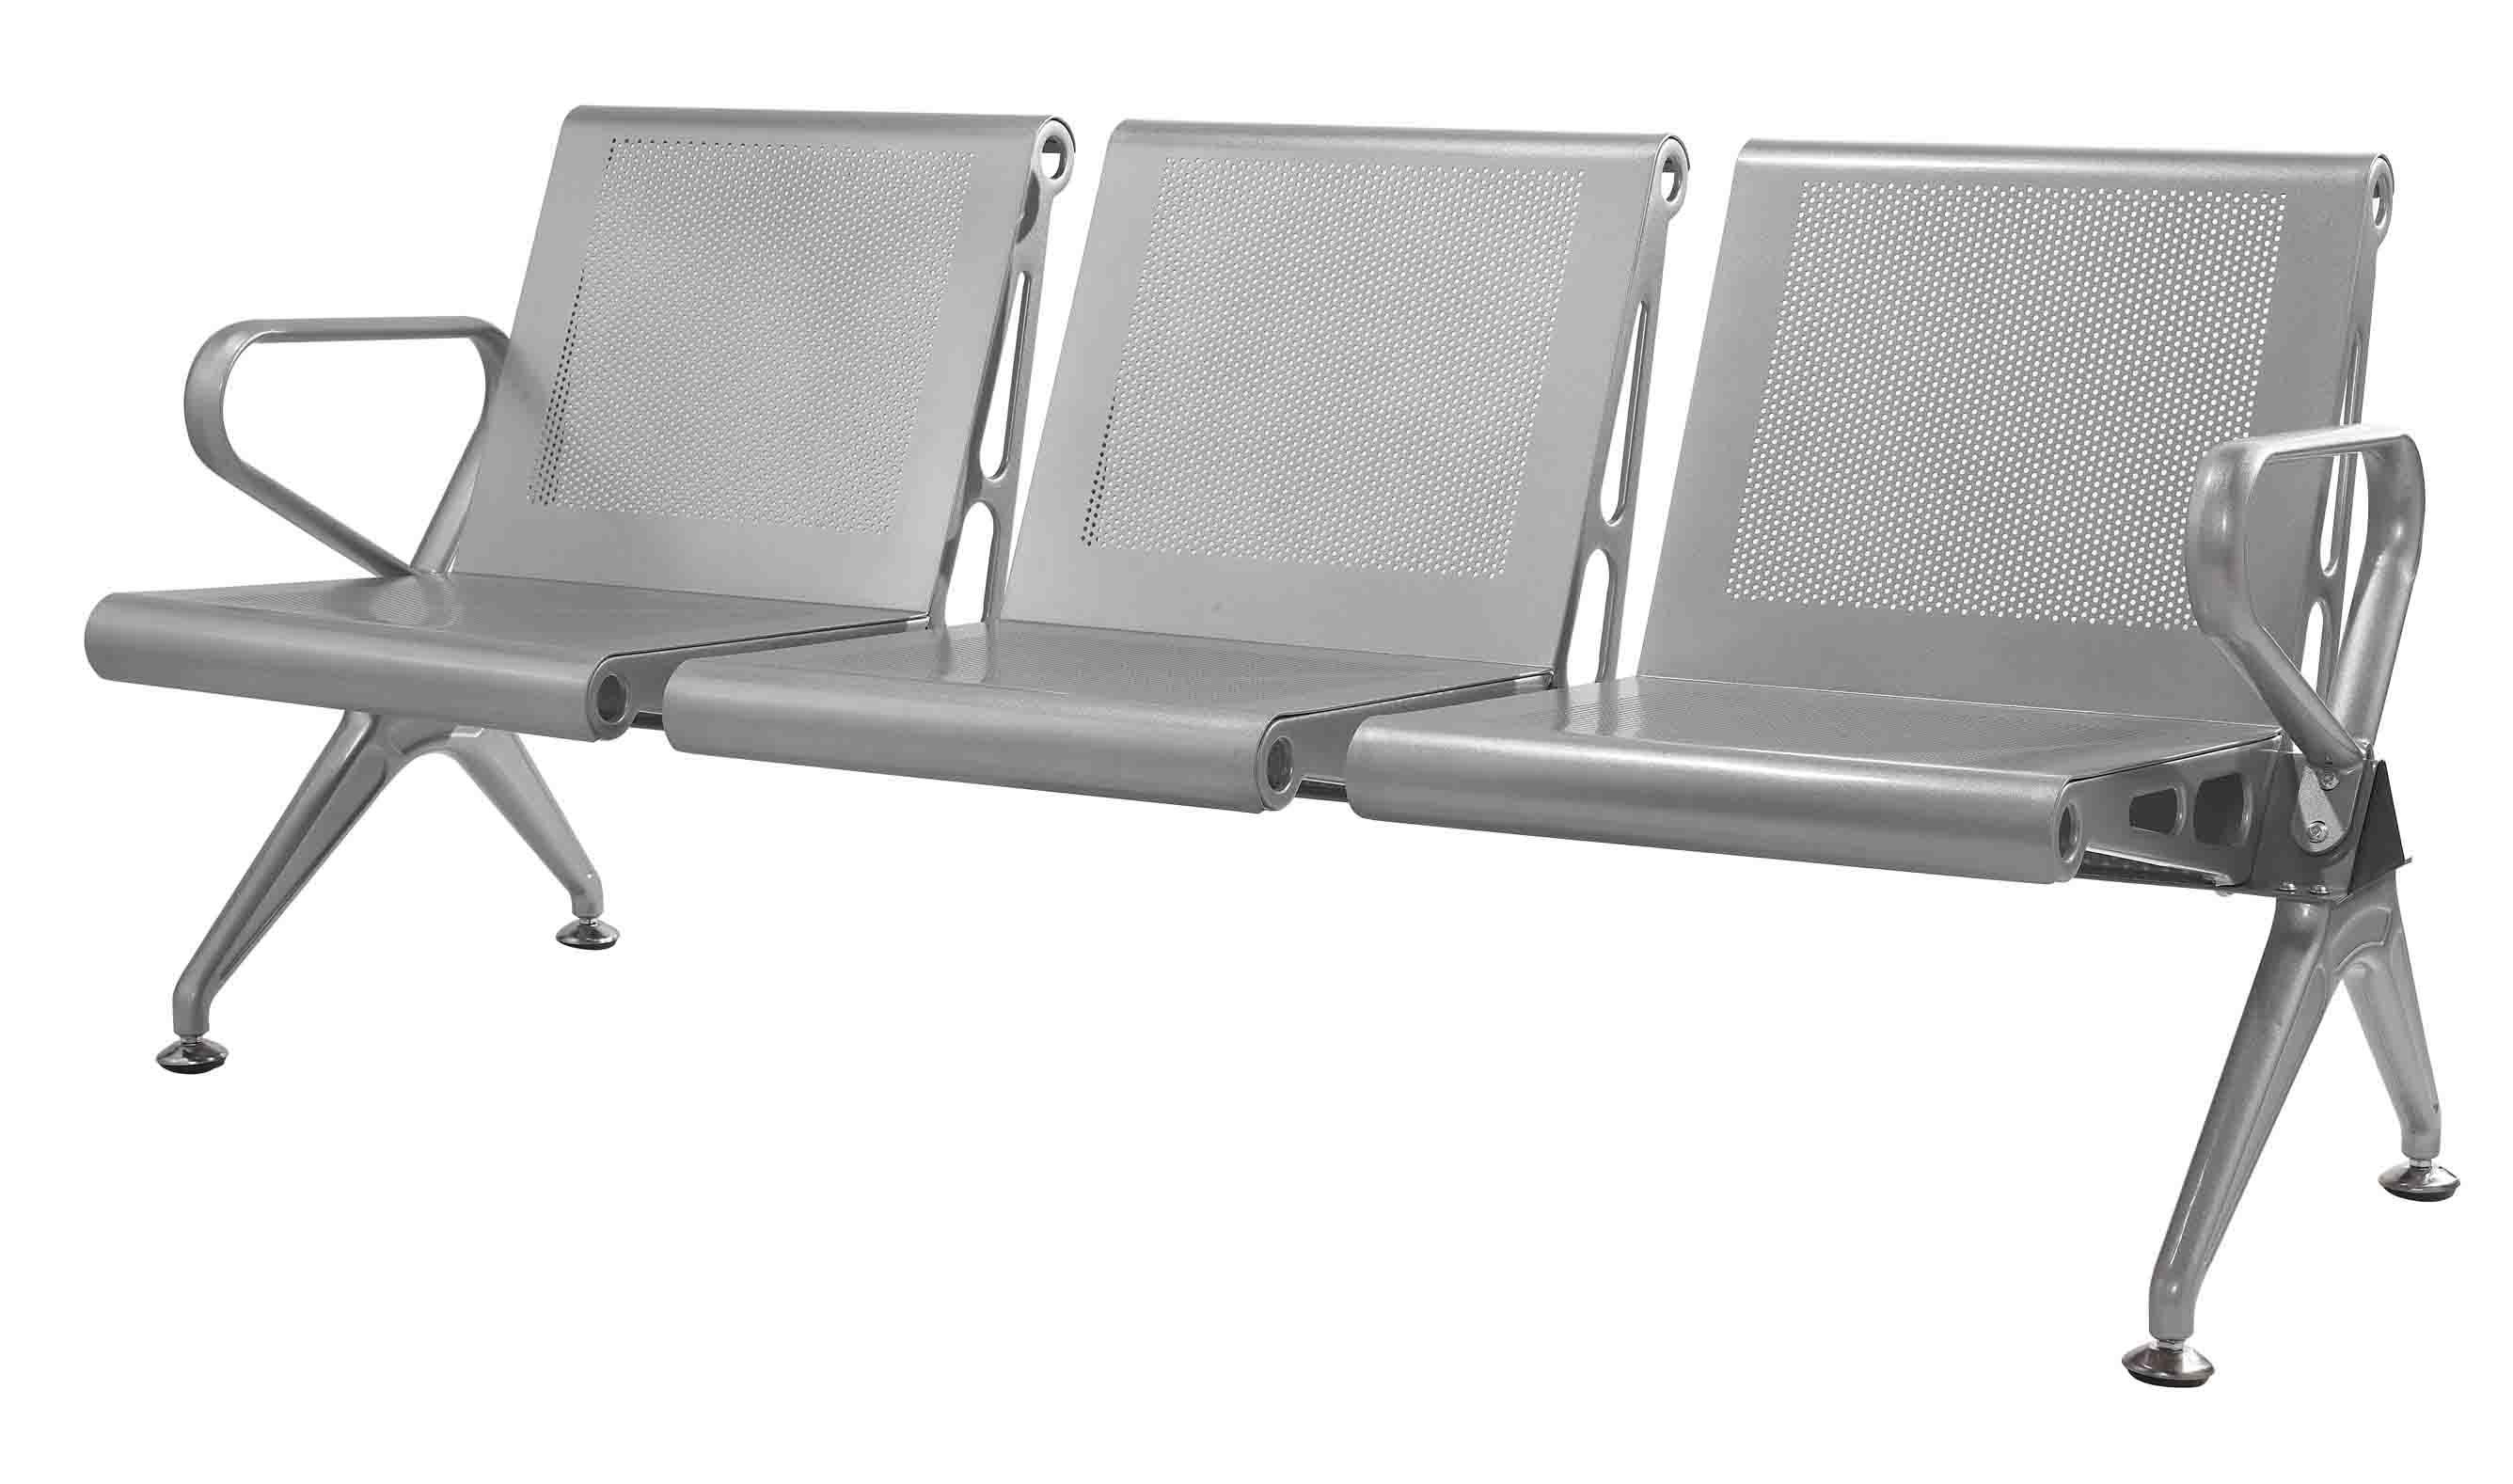 steel airport chair kitchen table and chairs walmart modern stil alüminyum havaalanı sandalye istasyonu